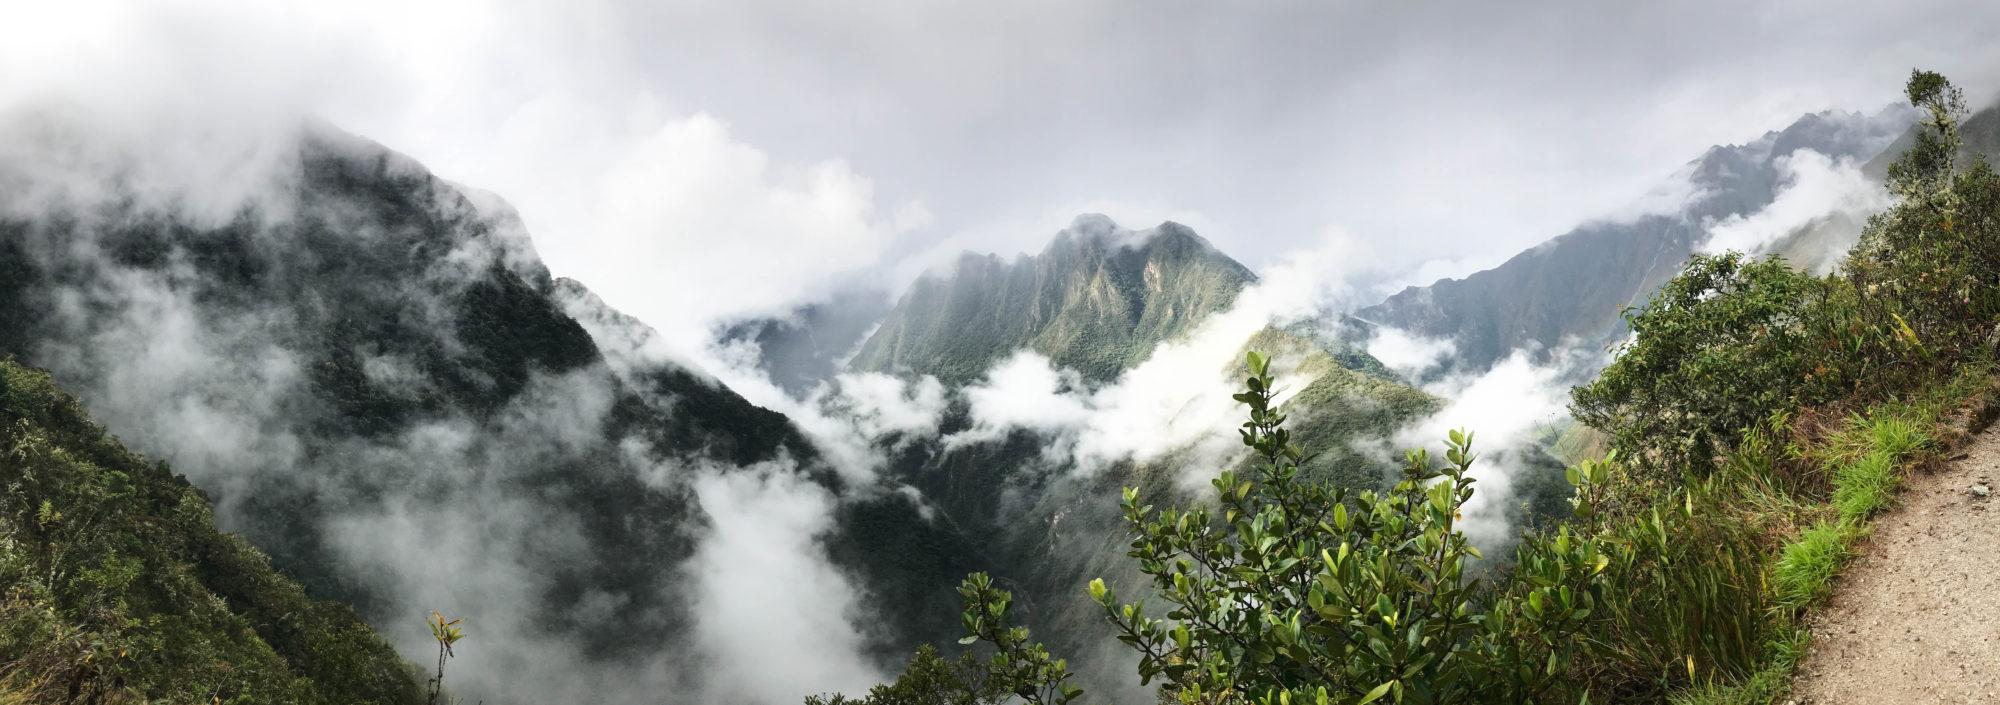 Hiking the Inca Trail to Machu Picchu | www.thatssoannie.com